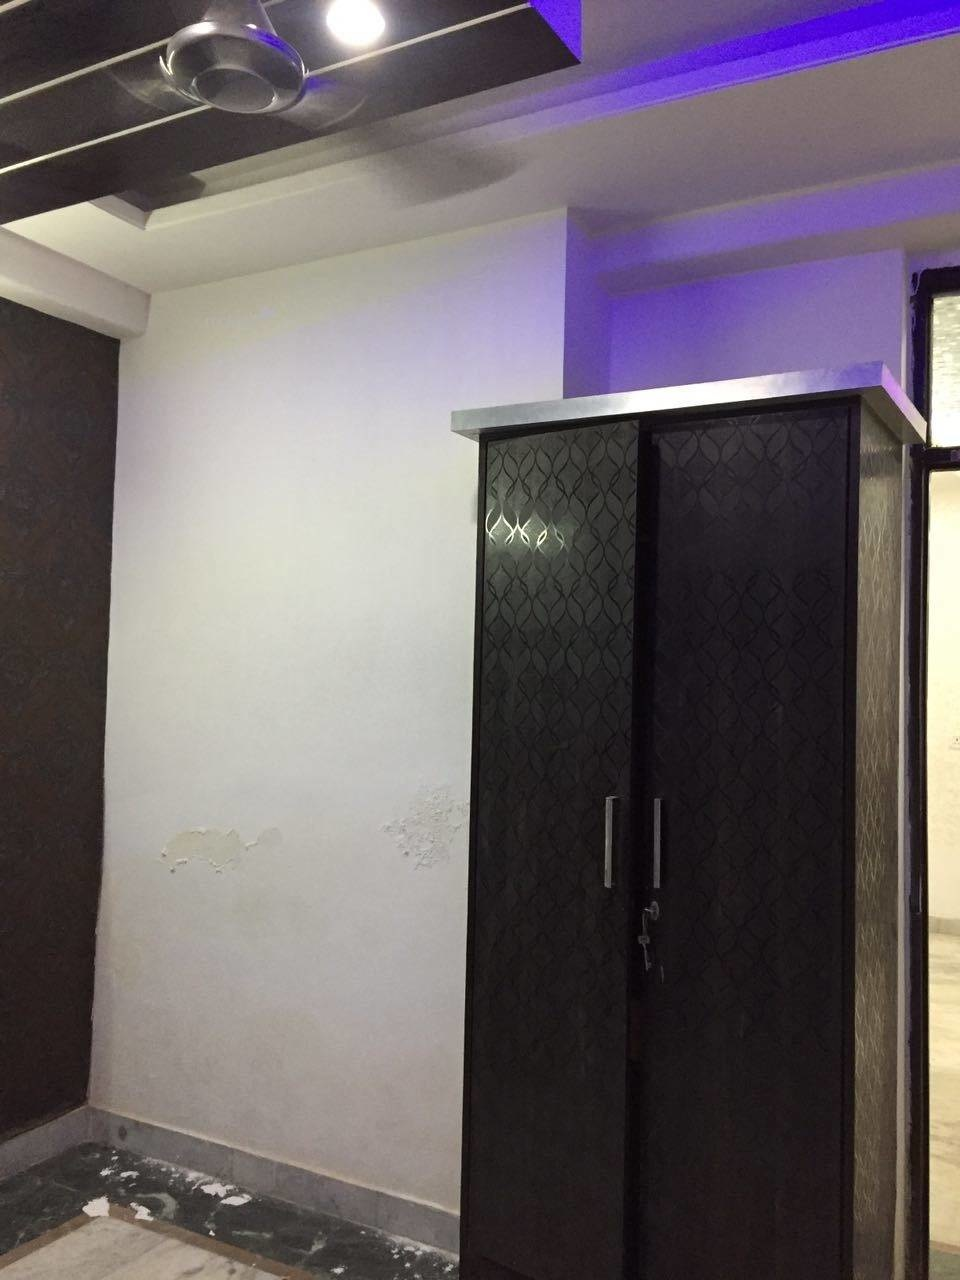 Cloud 9 skylish indirapuram ghaziabad flats in indirapuram price - 1 Bhk Residential Independent Builder Floors For Sale In Indirapuram Ghaziabad Makaan Com